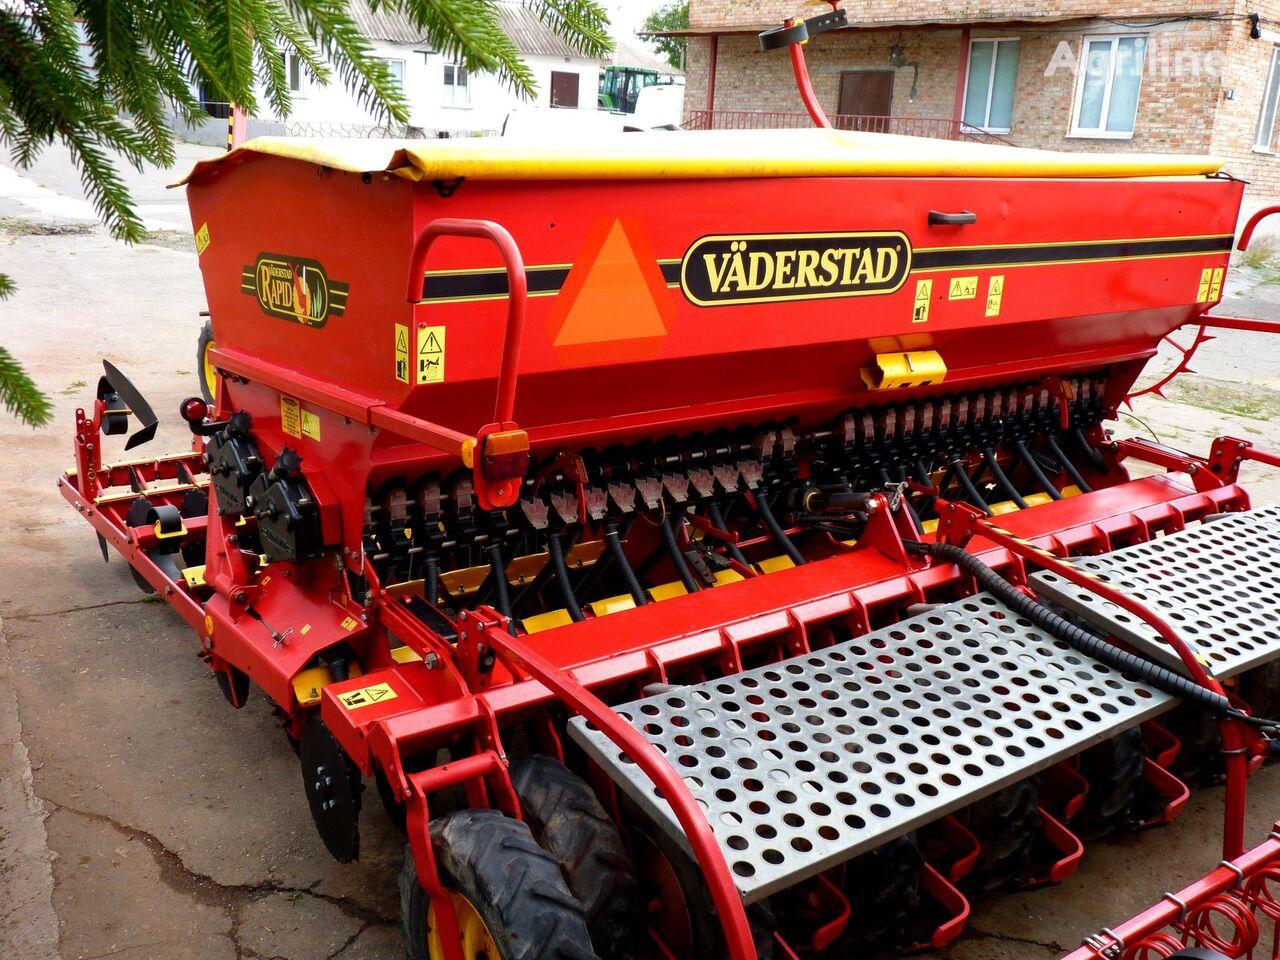 VÄDERSTAD Rapid 400C Super XL pneumatic seed drill